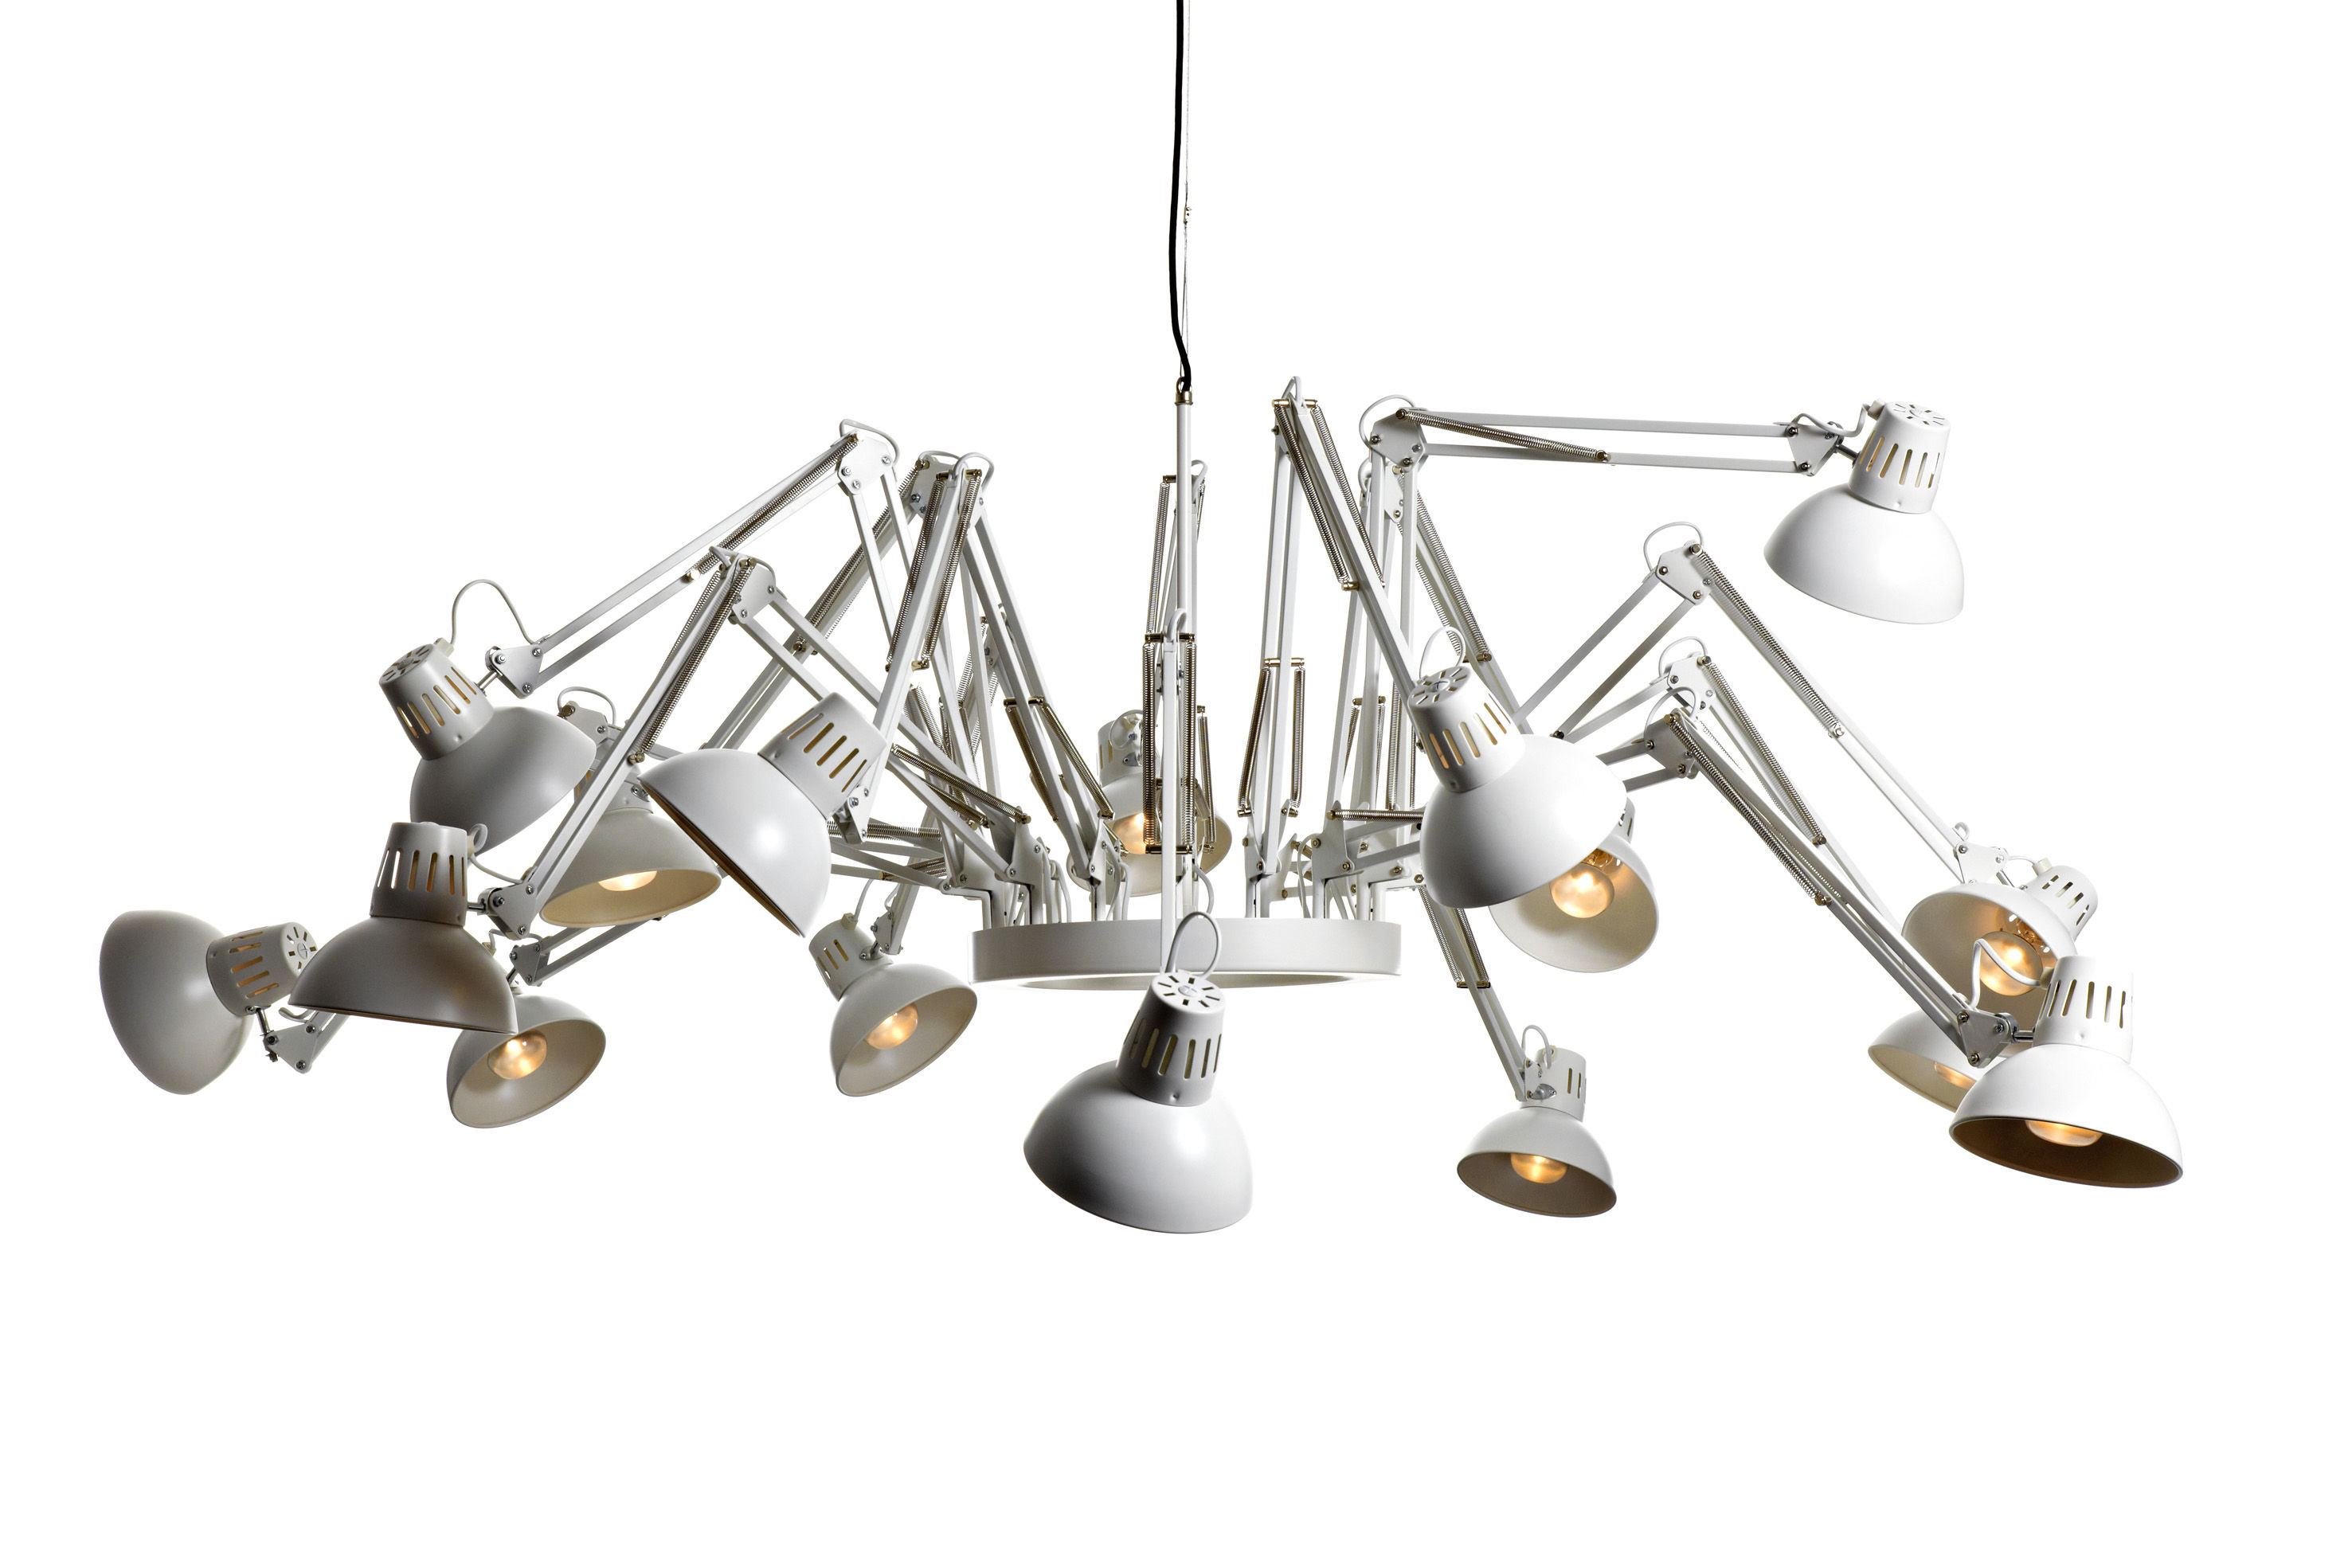 Lighting - Pendant Lighting - Dear Ingo Pendant by Moooi - White - Steel